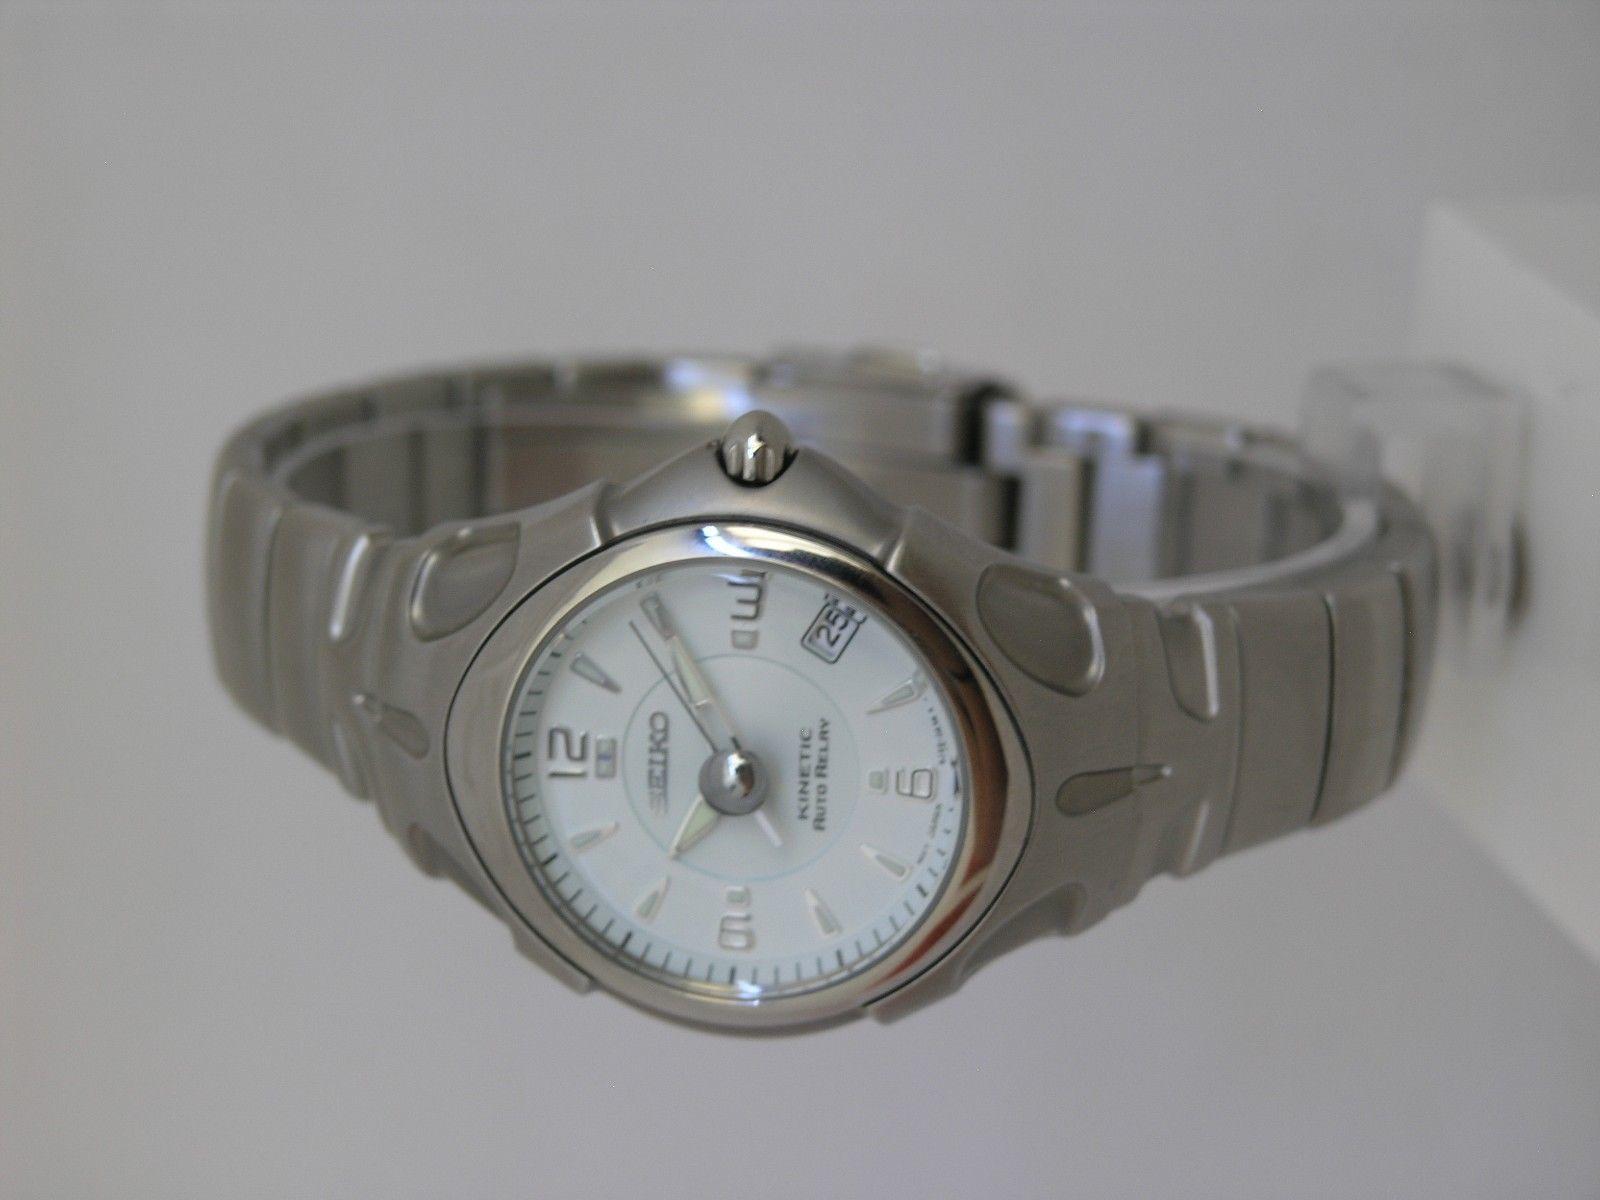 Seiko watch stainless steel kinetic movement 5J22 SMA013